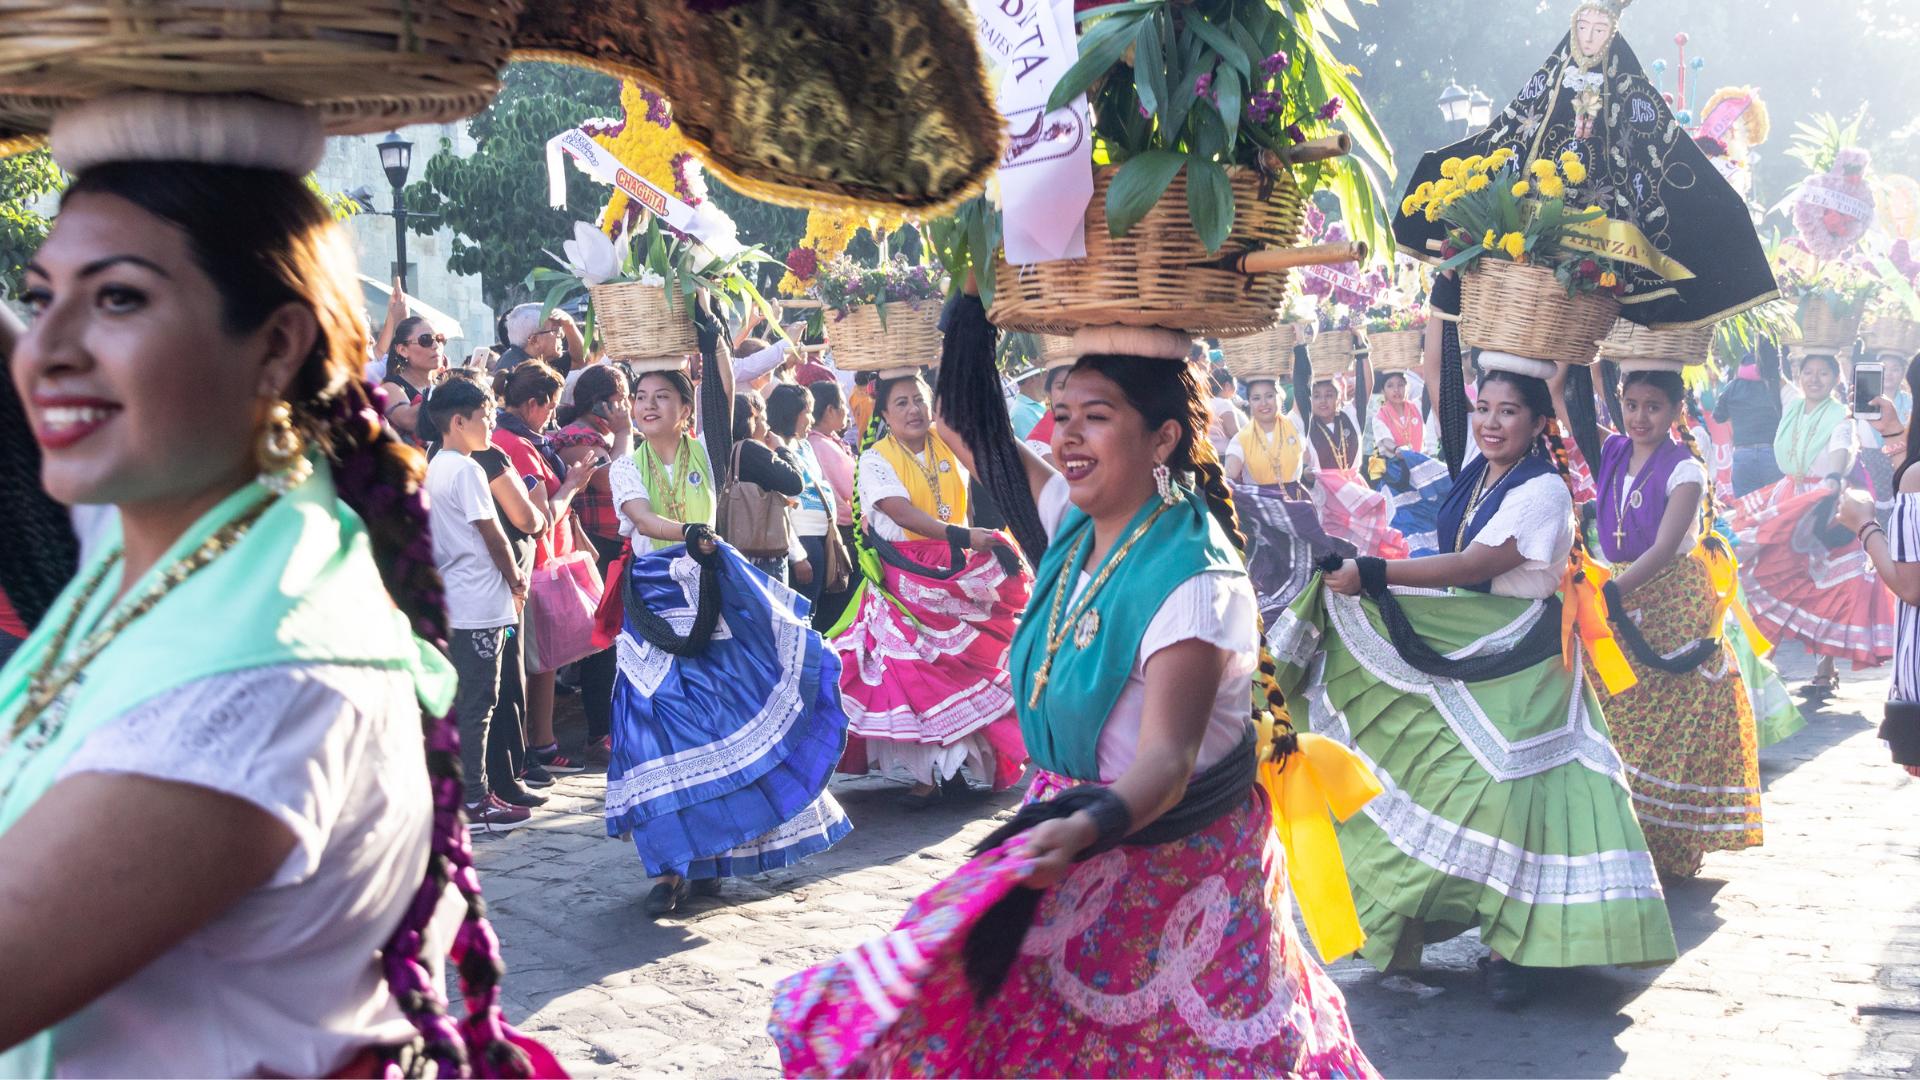 Meksika stebina išskirtine kultūra